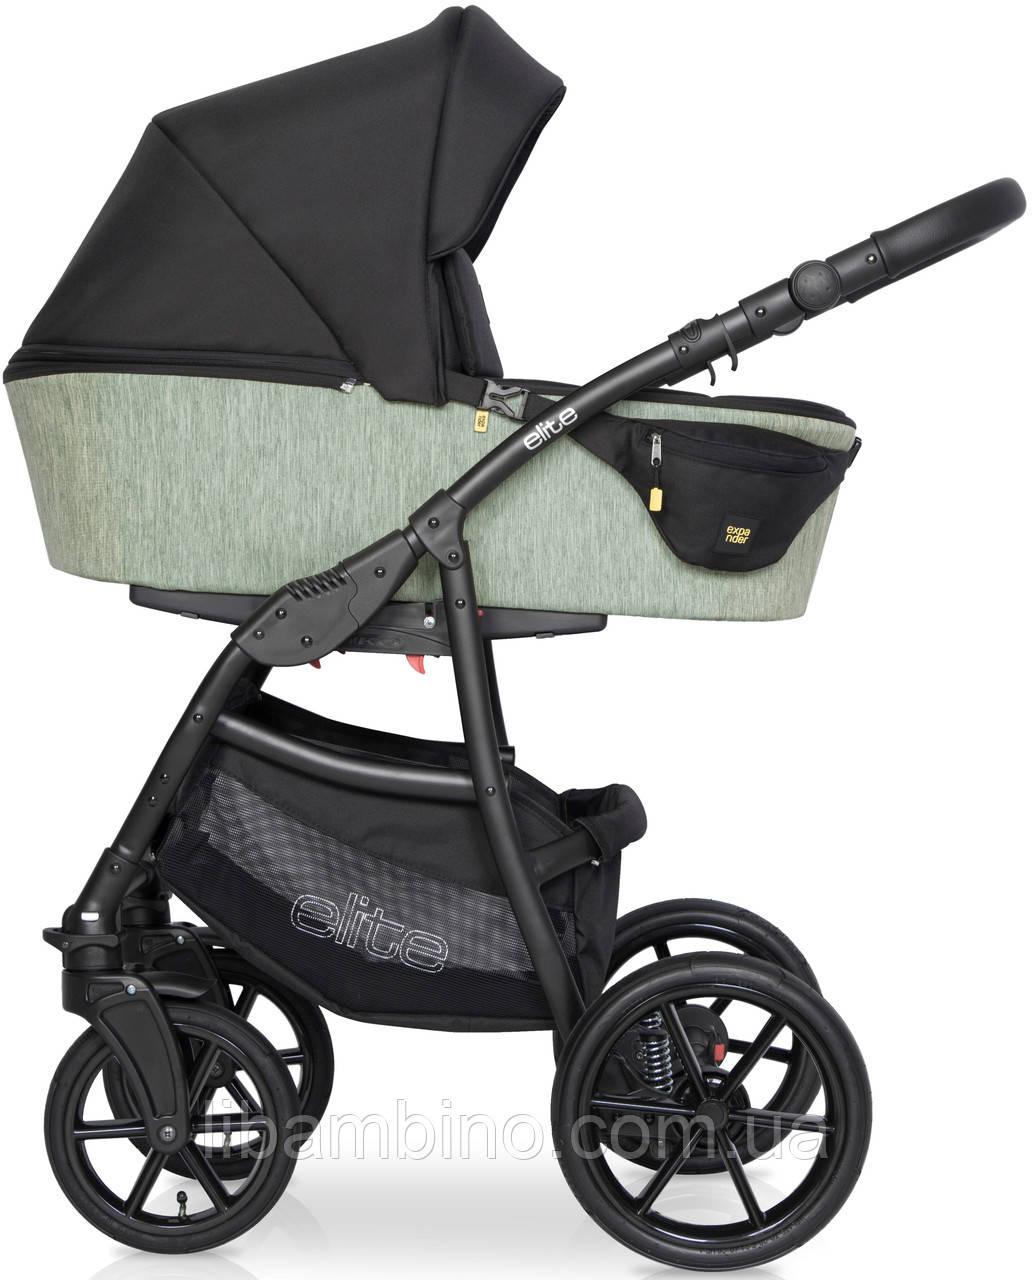 Дитяча універсальна коляска 2 в 1 Expander Elite 05 Mint